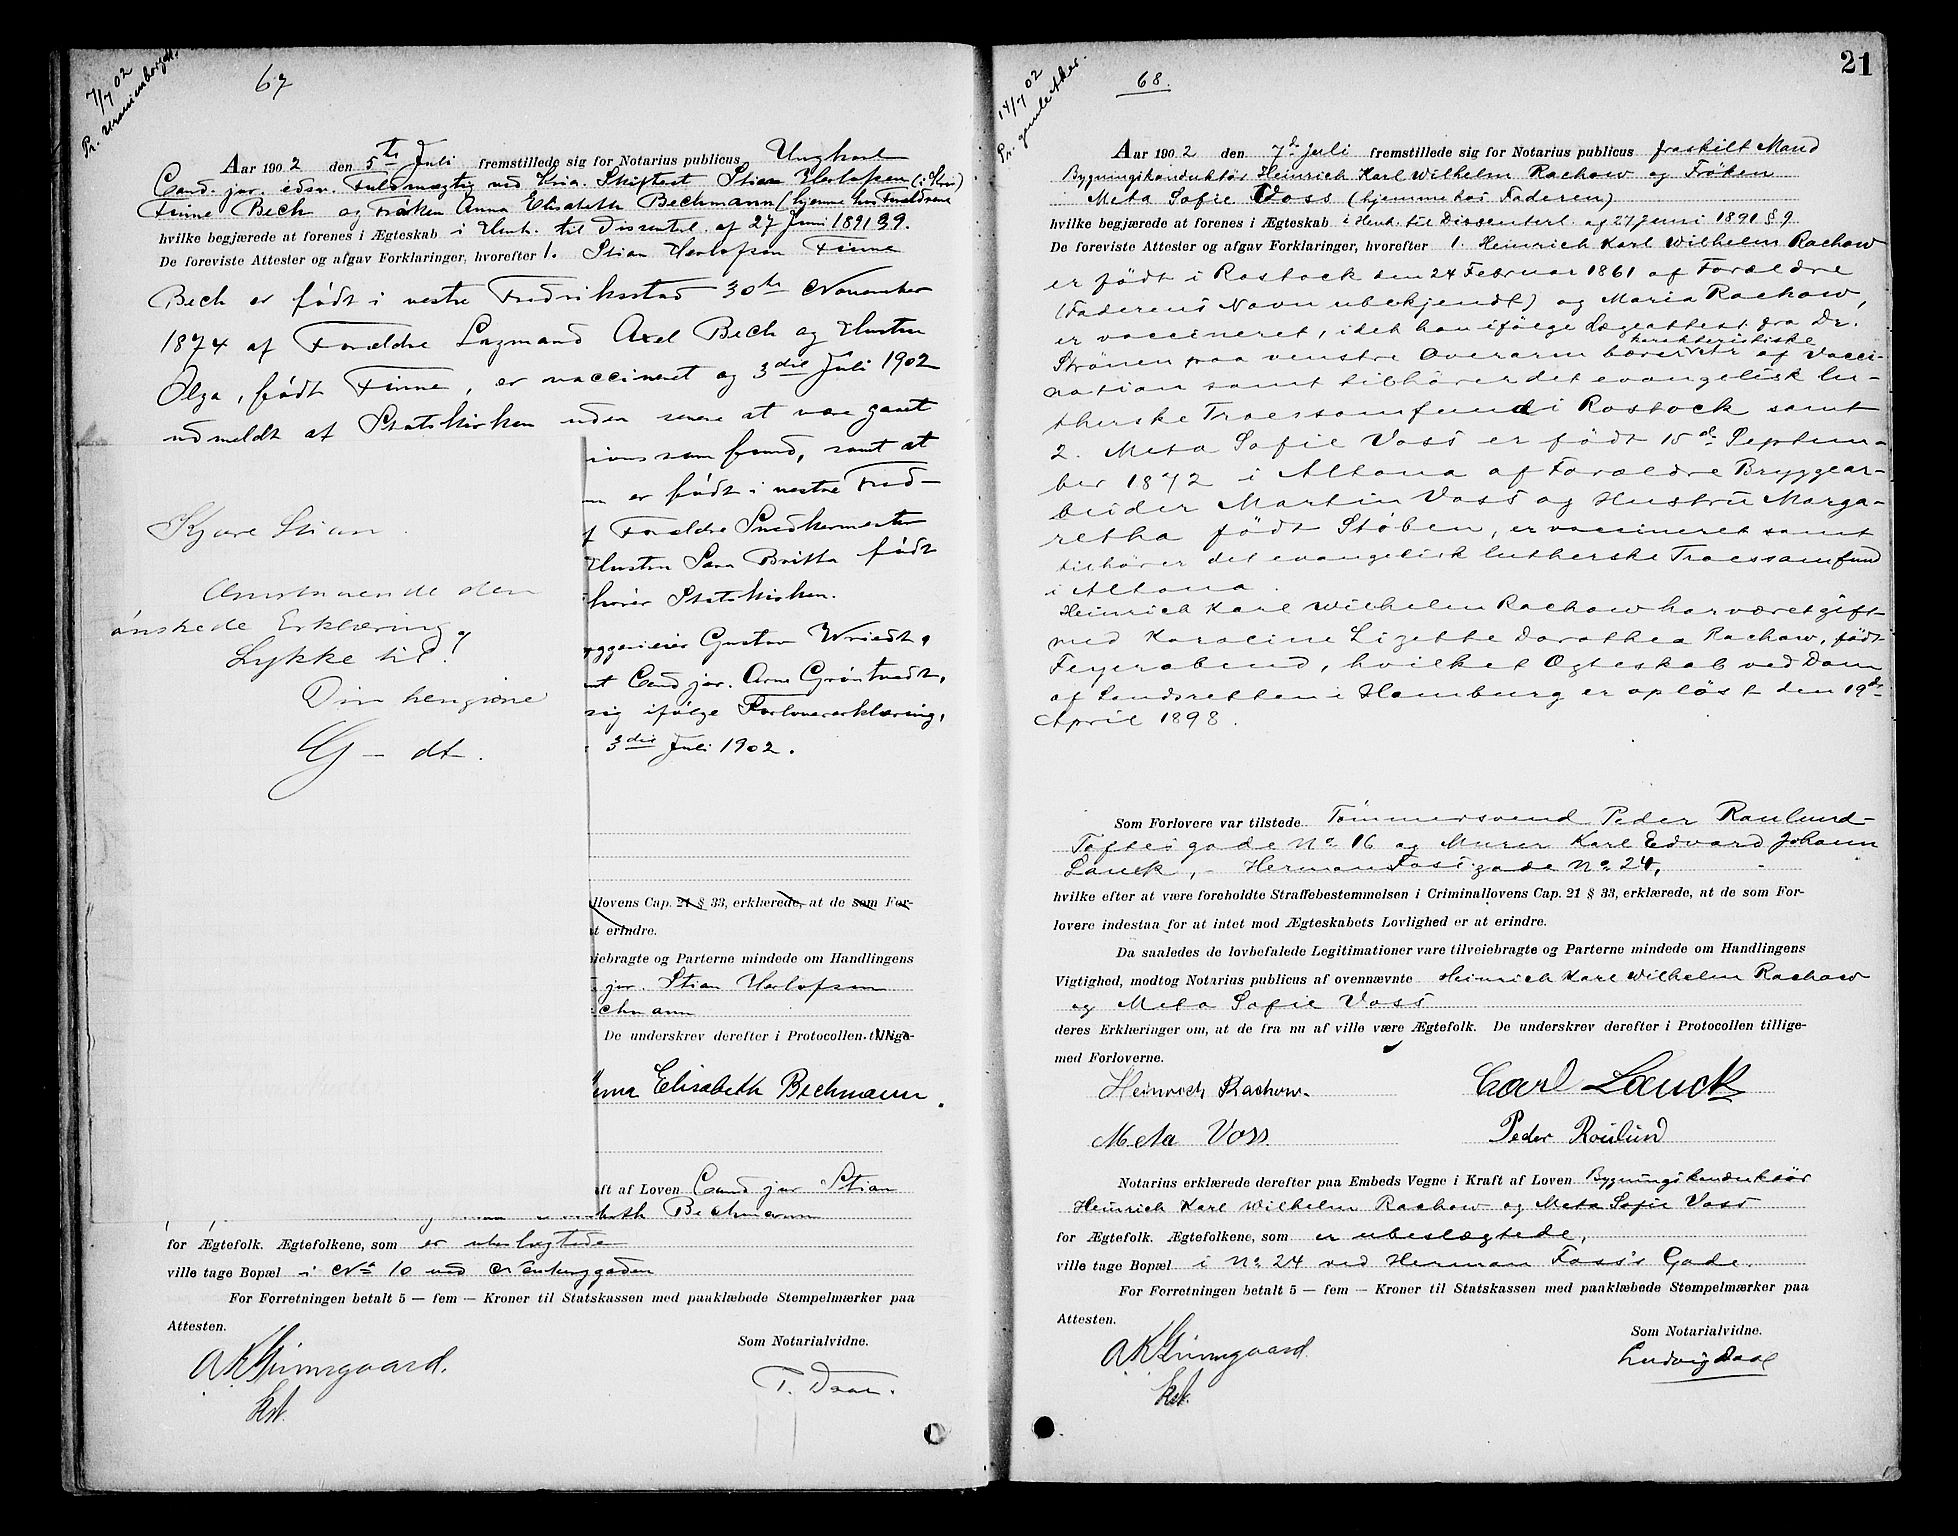 SAO, Oslo byfogd avd. I, L/Lb/Lbb/L0006: Notarialprotokoll, rekke II: Vigsler, 1902-1907, s. 20b-21a